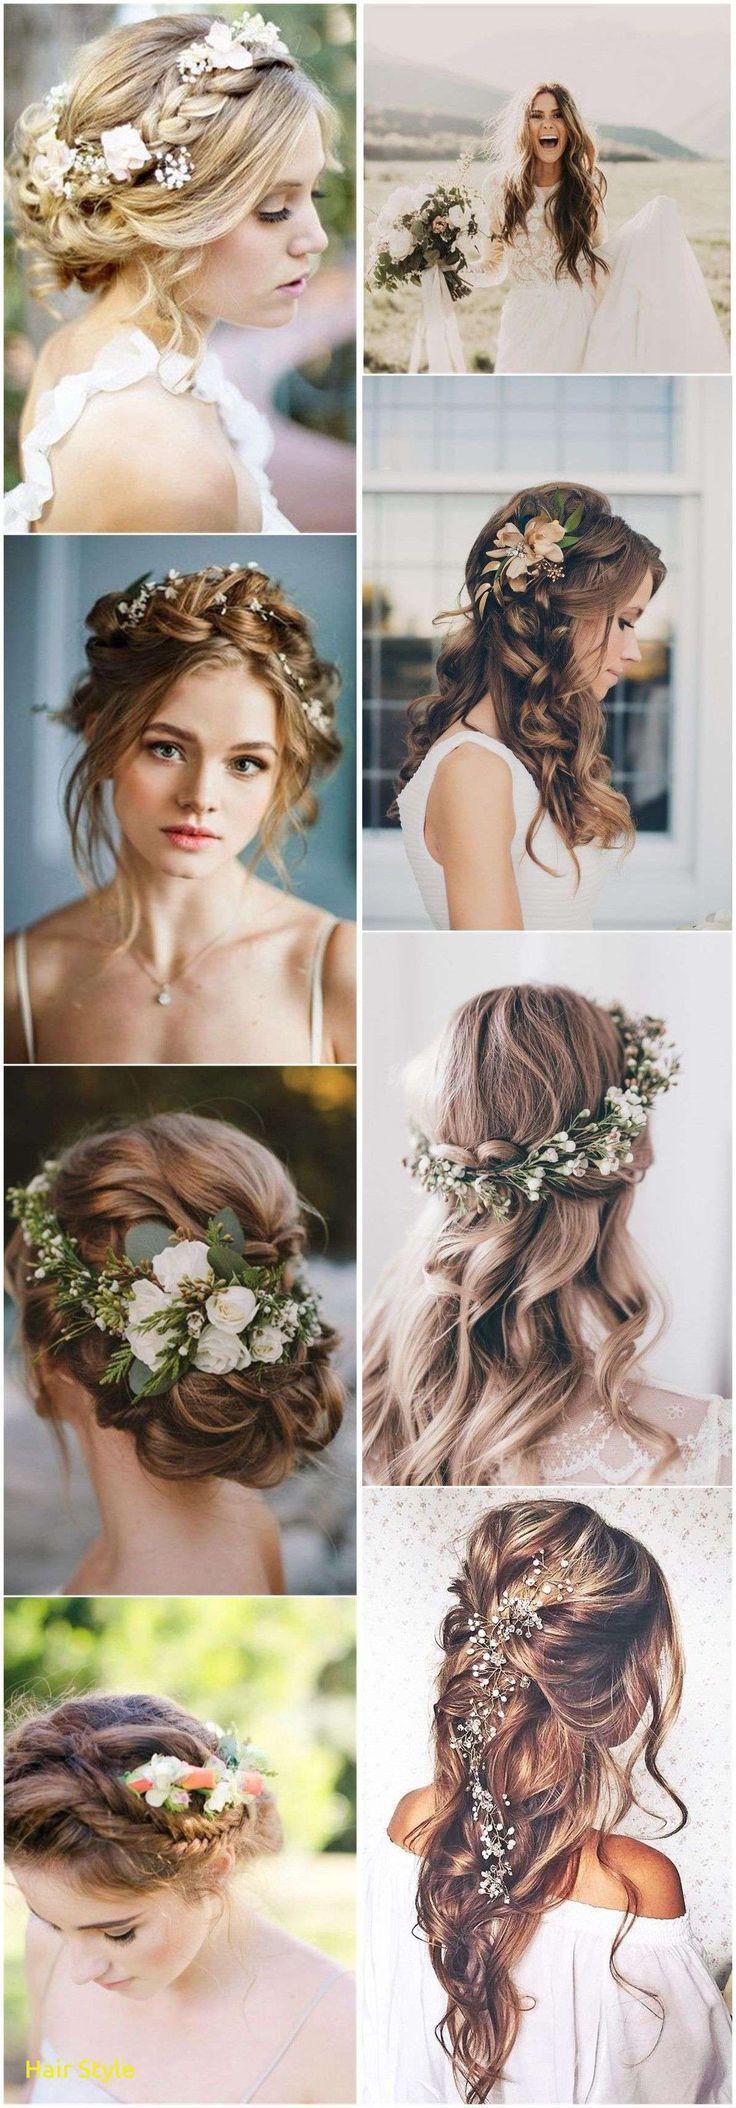 Fresh Boho Beach Wedding Hair #Beach #Boho #Fresh #Hair #Hairstyle